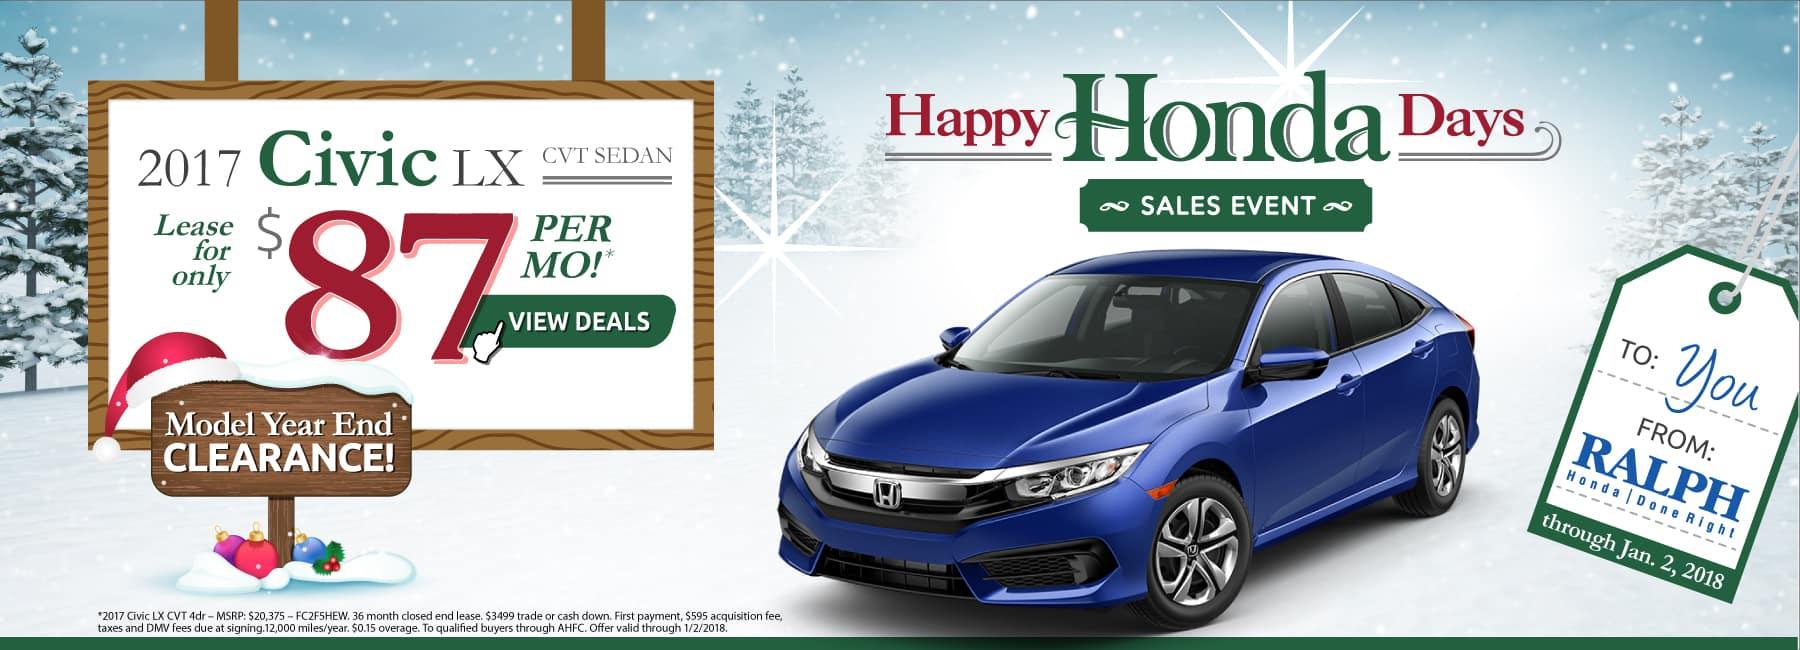 Honda lease deals rochester ny lamoureph blog for Honda lease options